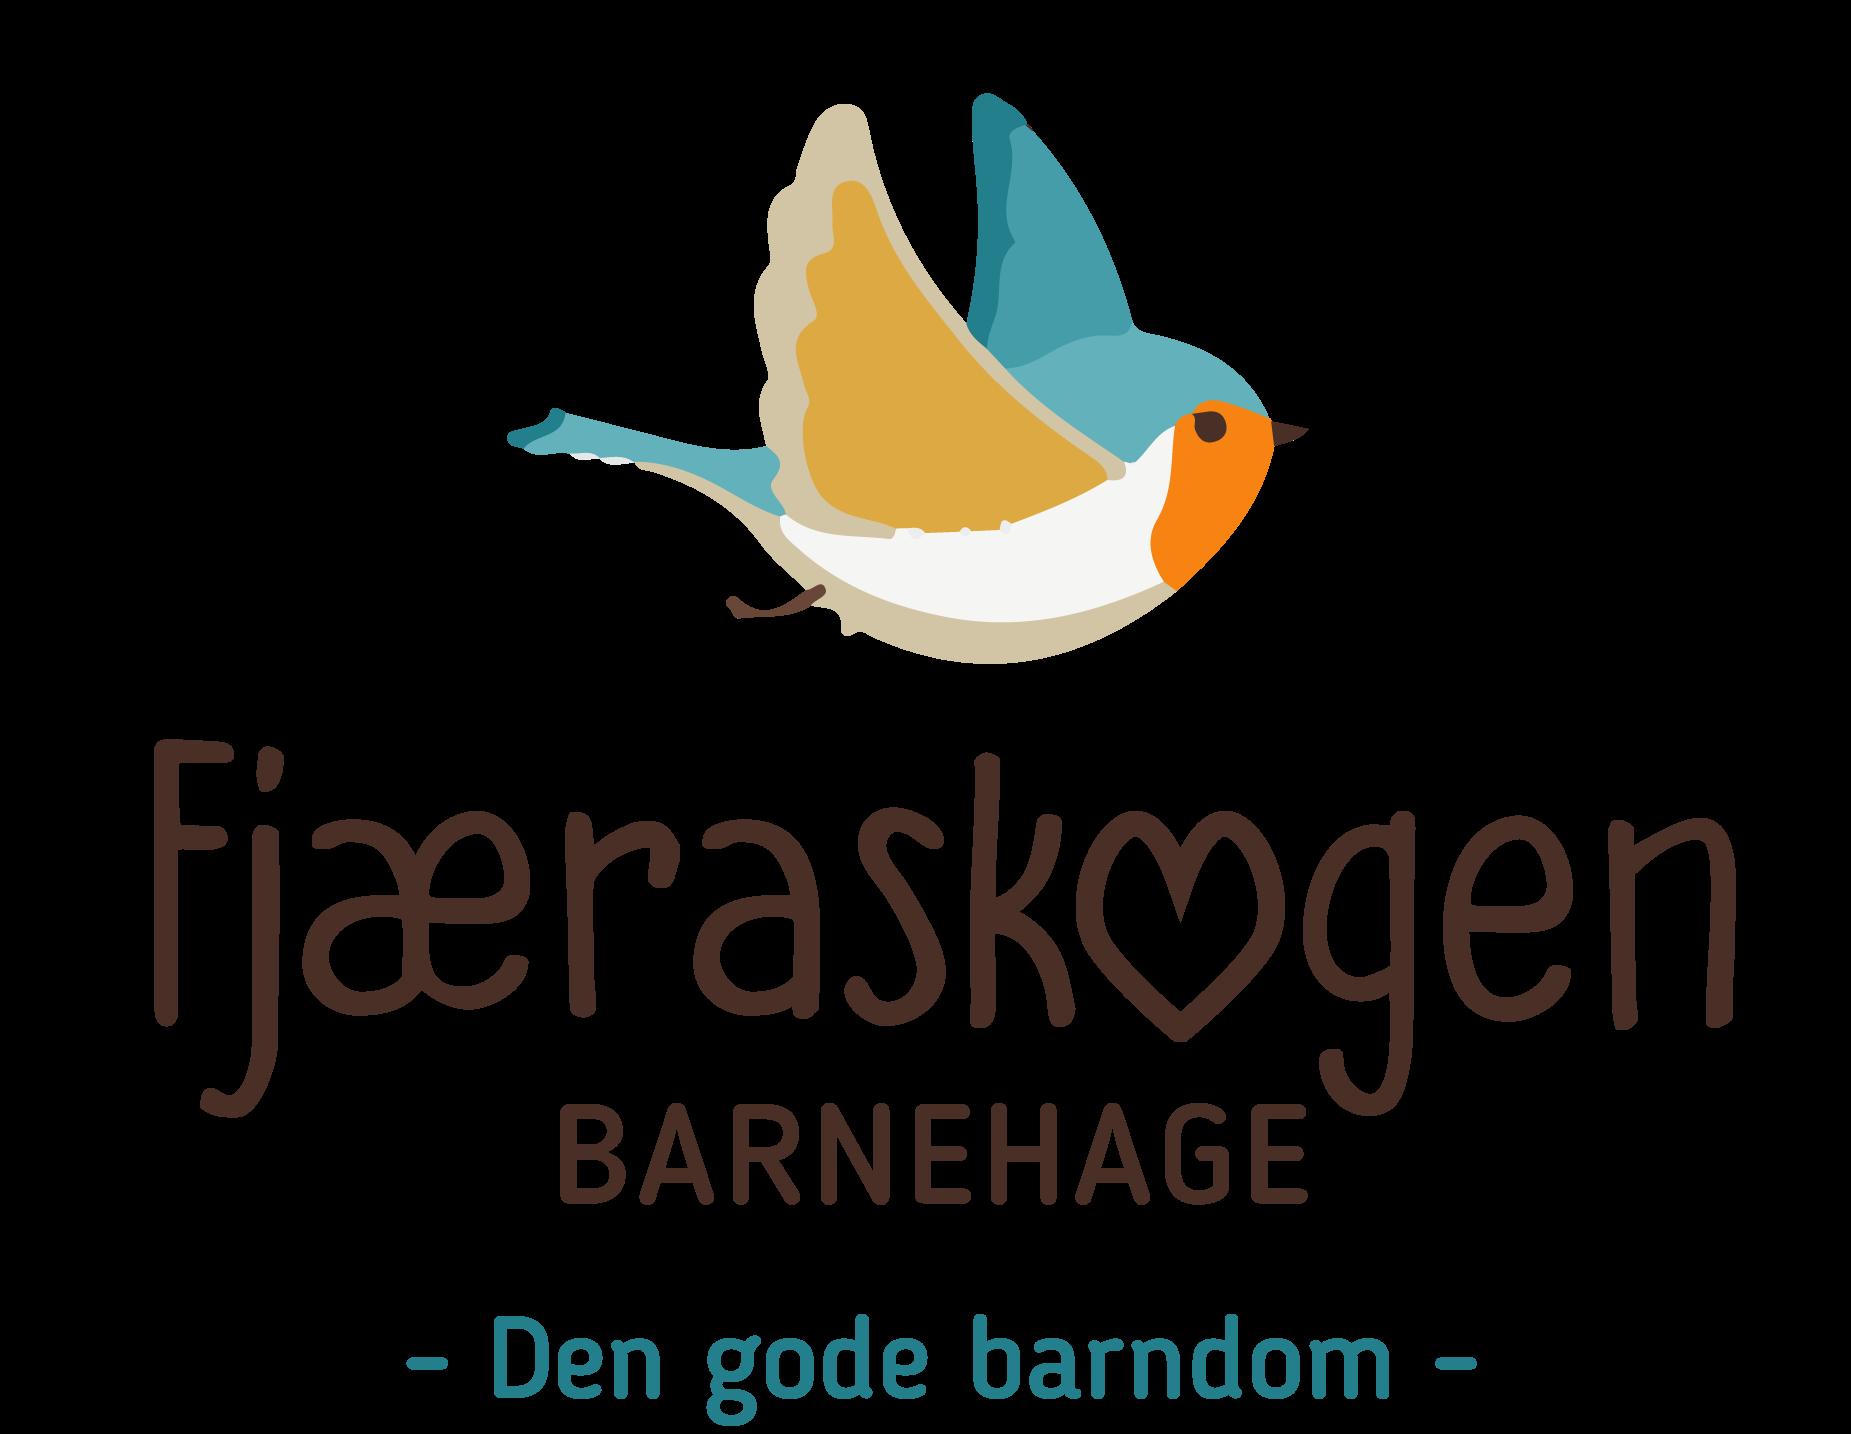 Fjæraskogen Barnehage Logo